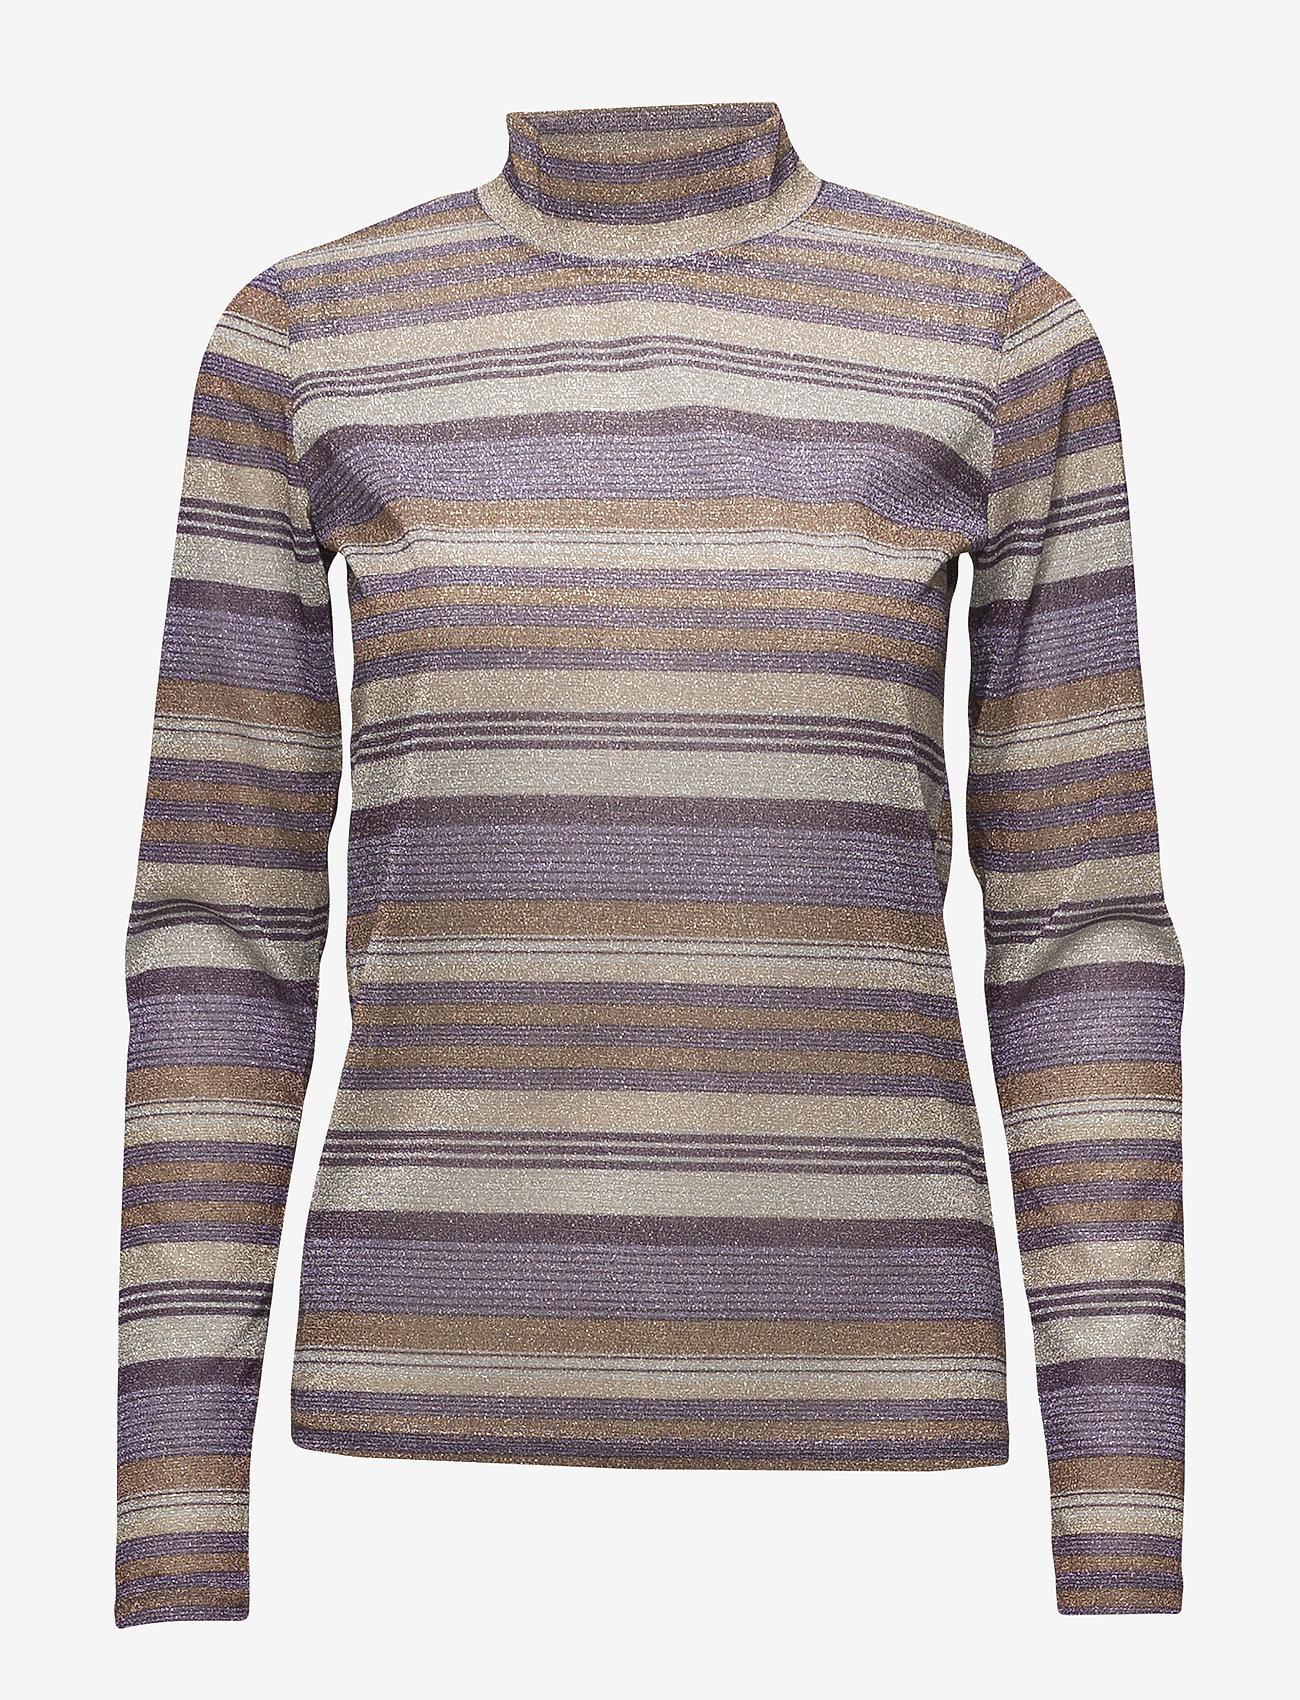 Gestuz - Shine turtleneck MA18 - langärmlige tops - purple/gold - 0